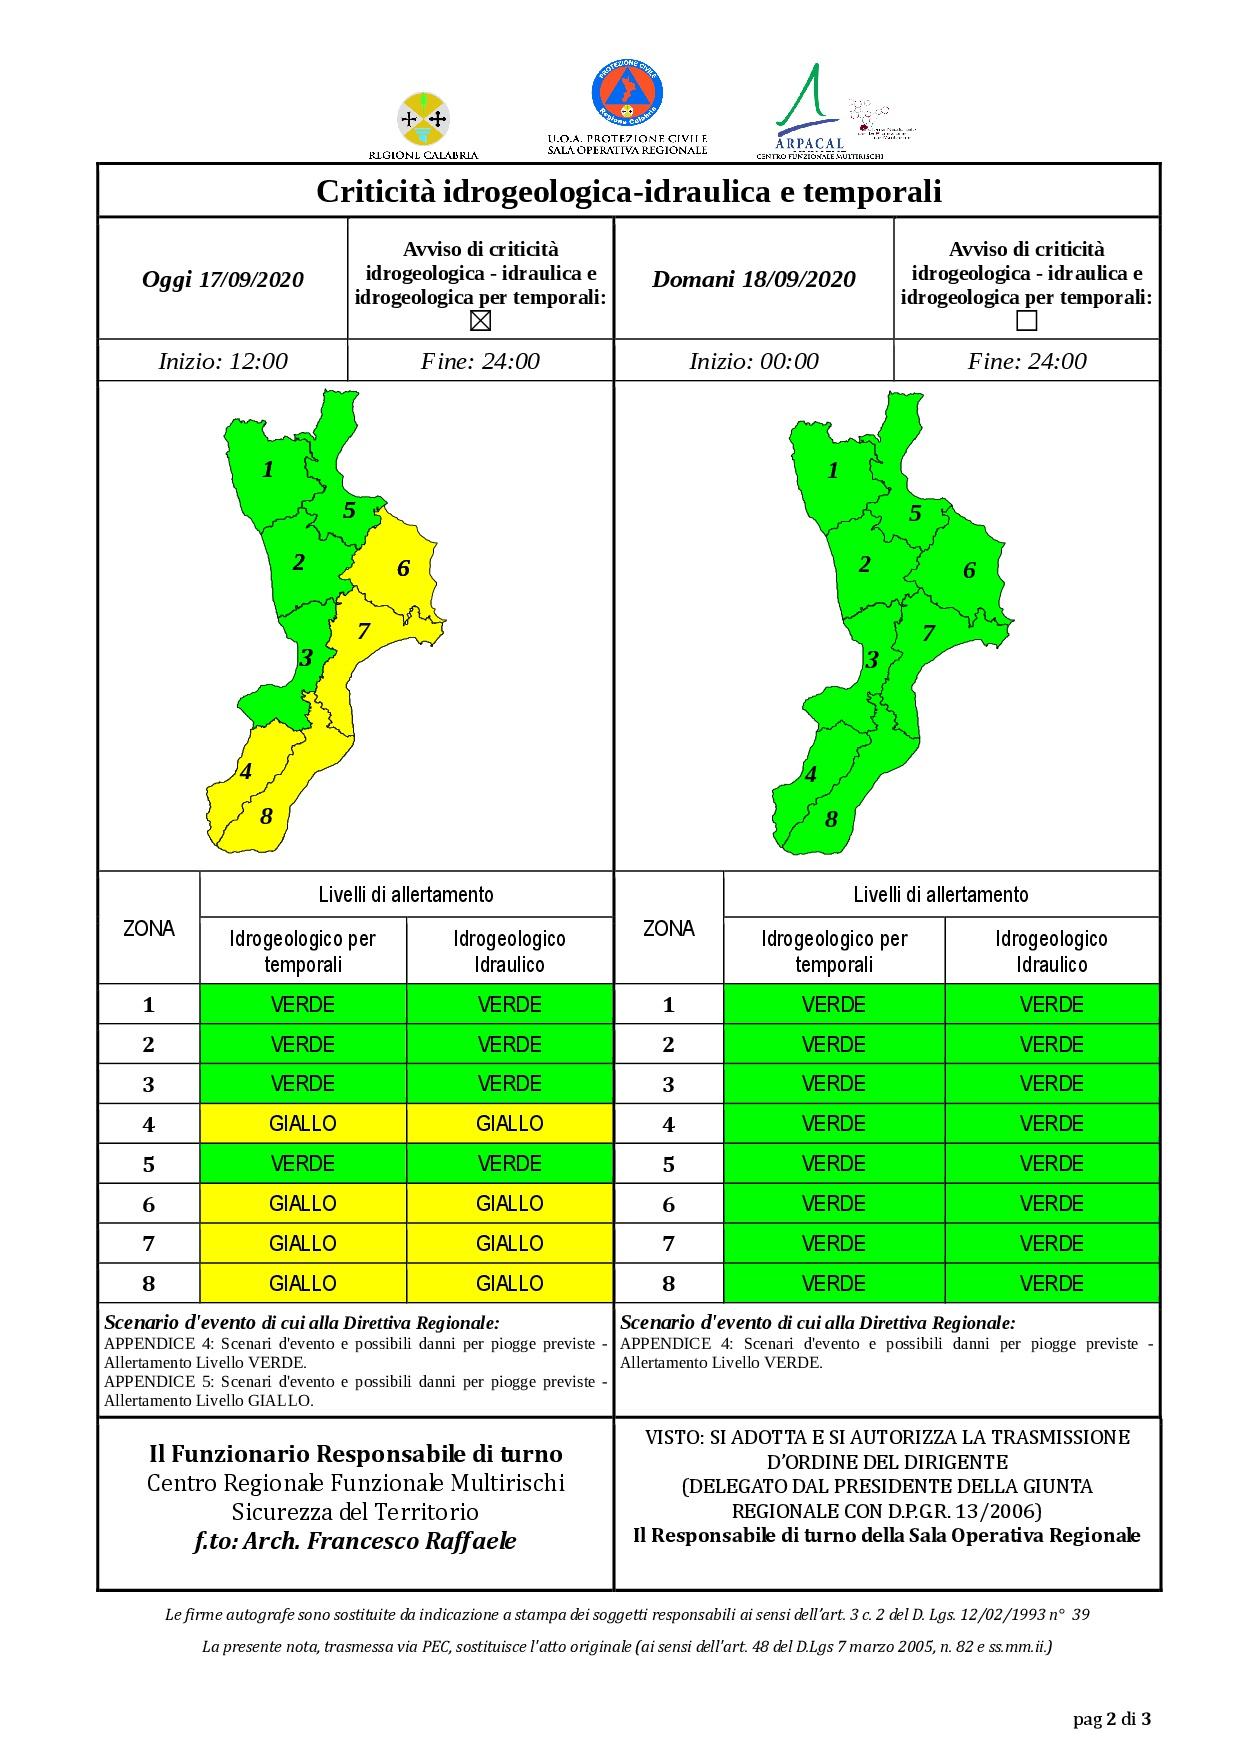 Criticità idrogeologica-idraulica e temporali in Calabria 17-09-2020